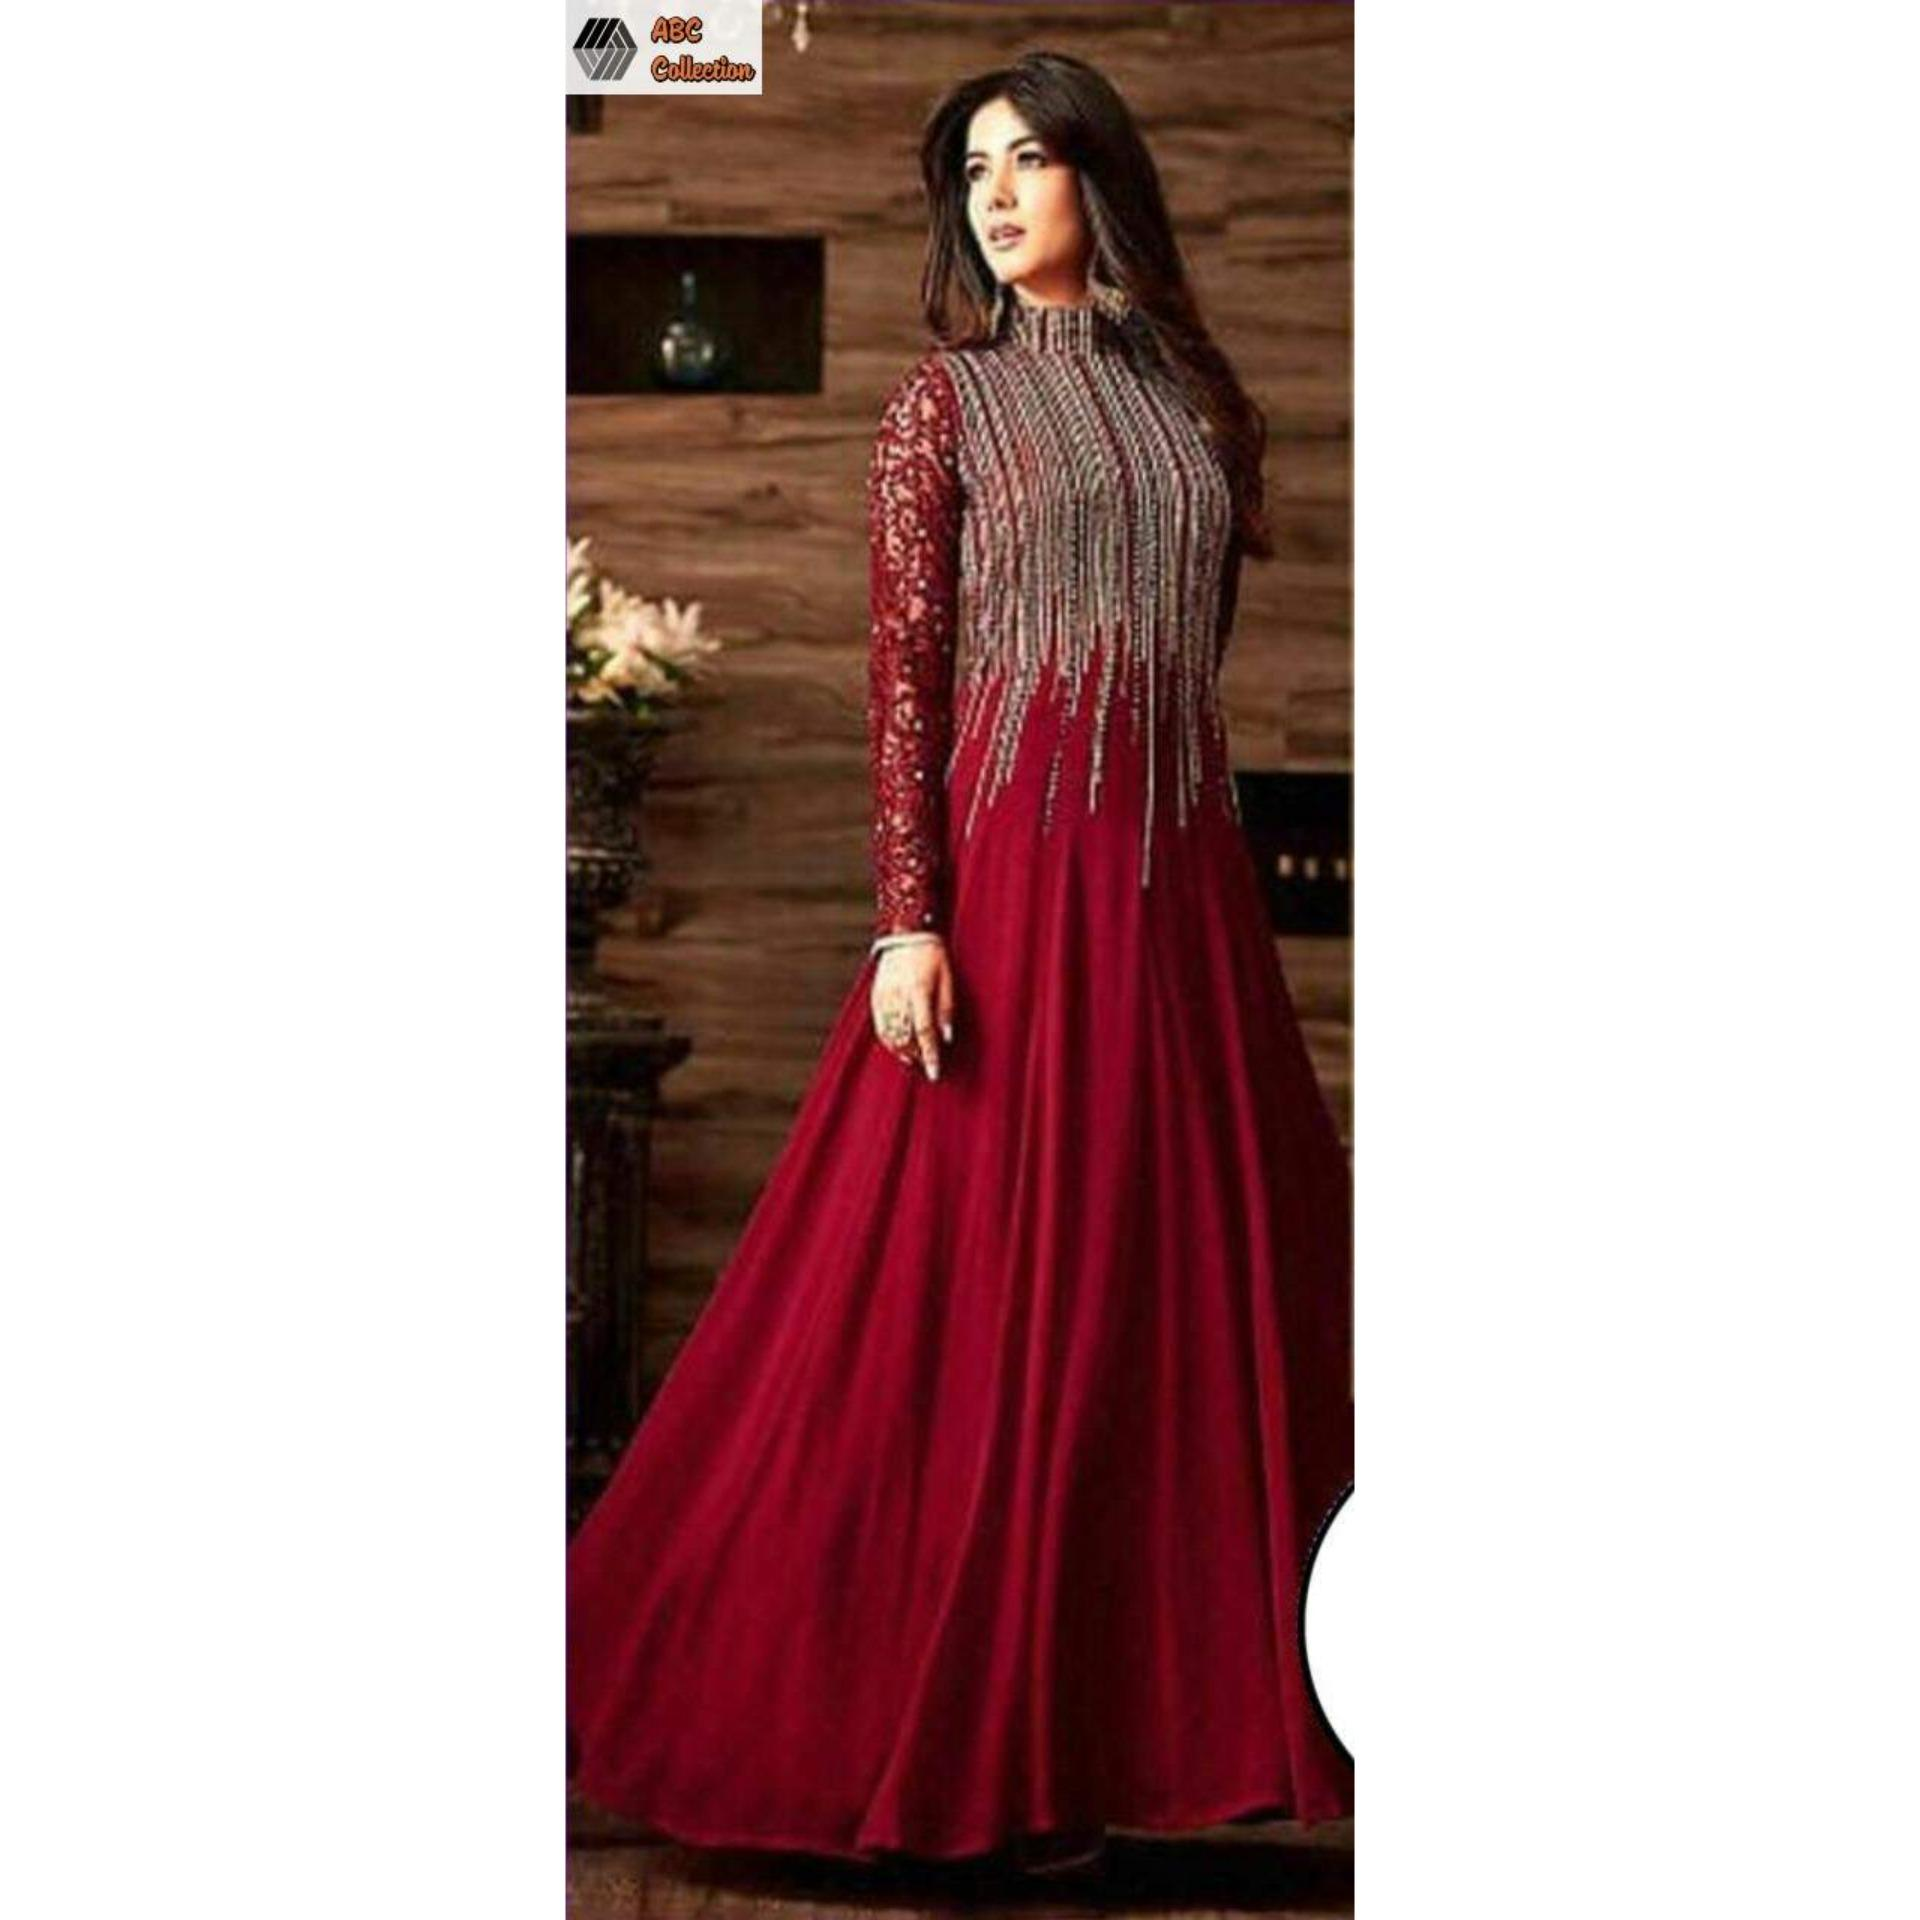 3c356afb014 Buy Women Dresses   Suits   Best Price in Pakistan - Daraz.pk